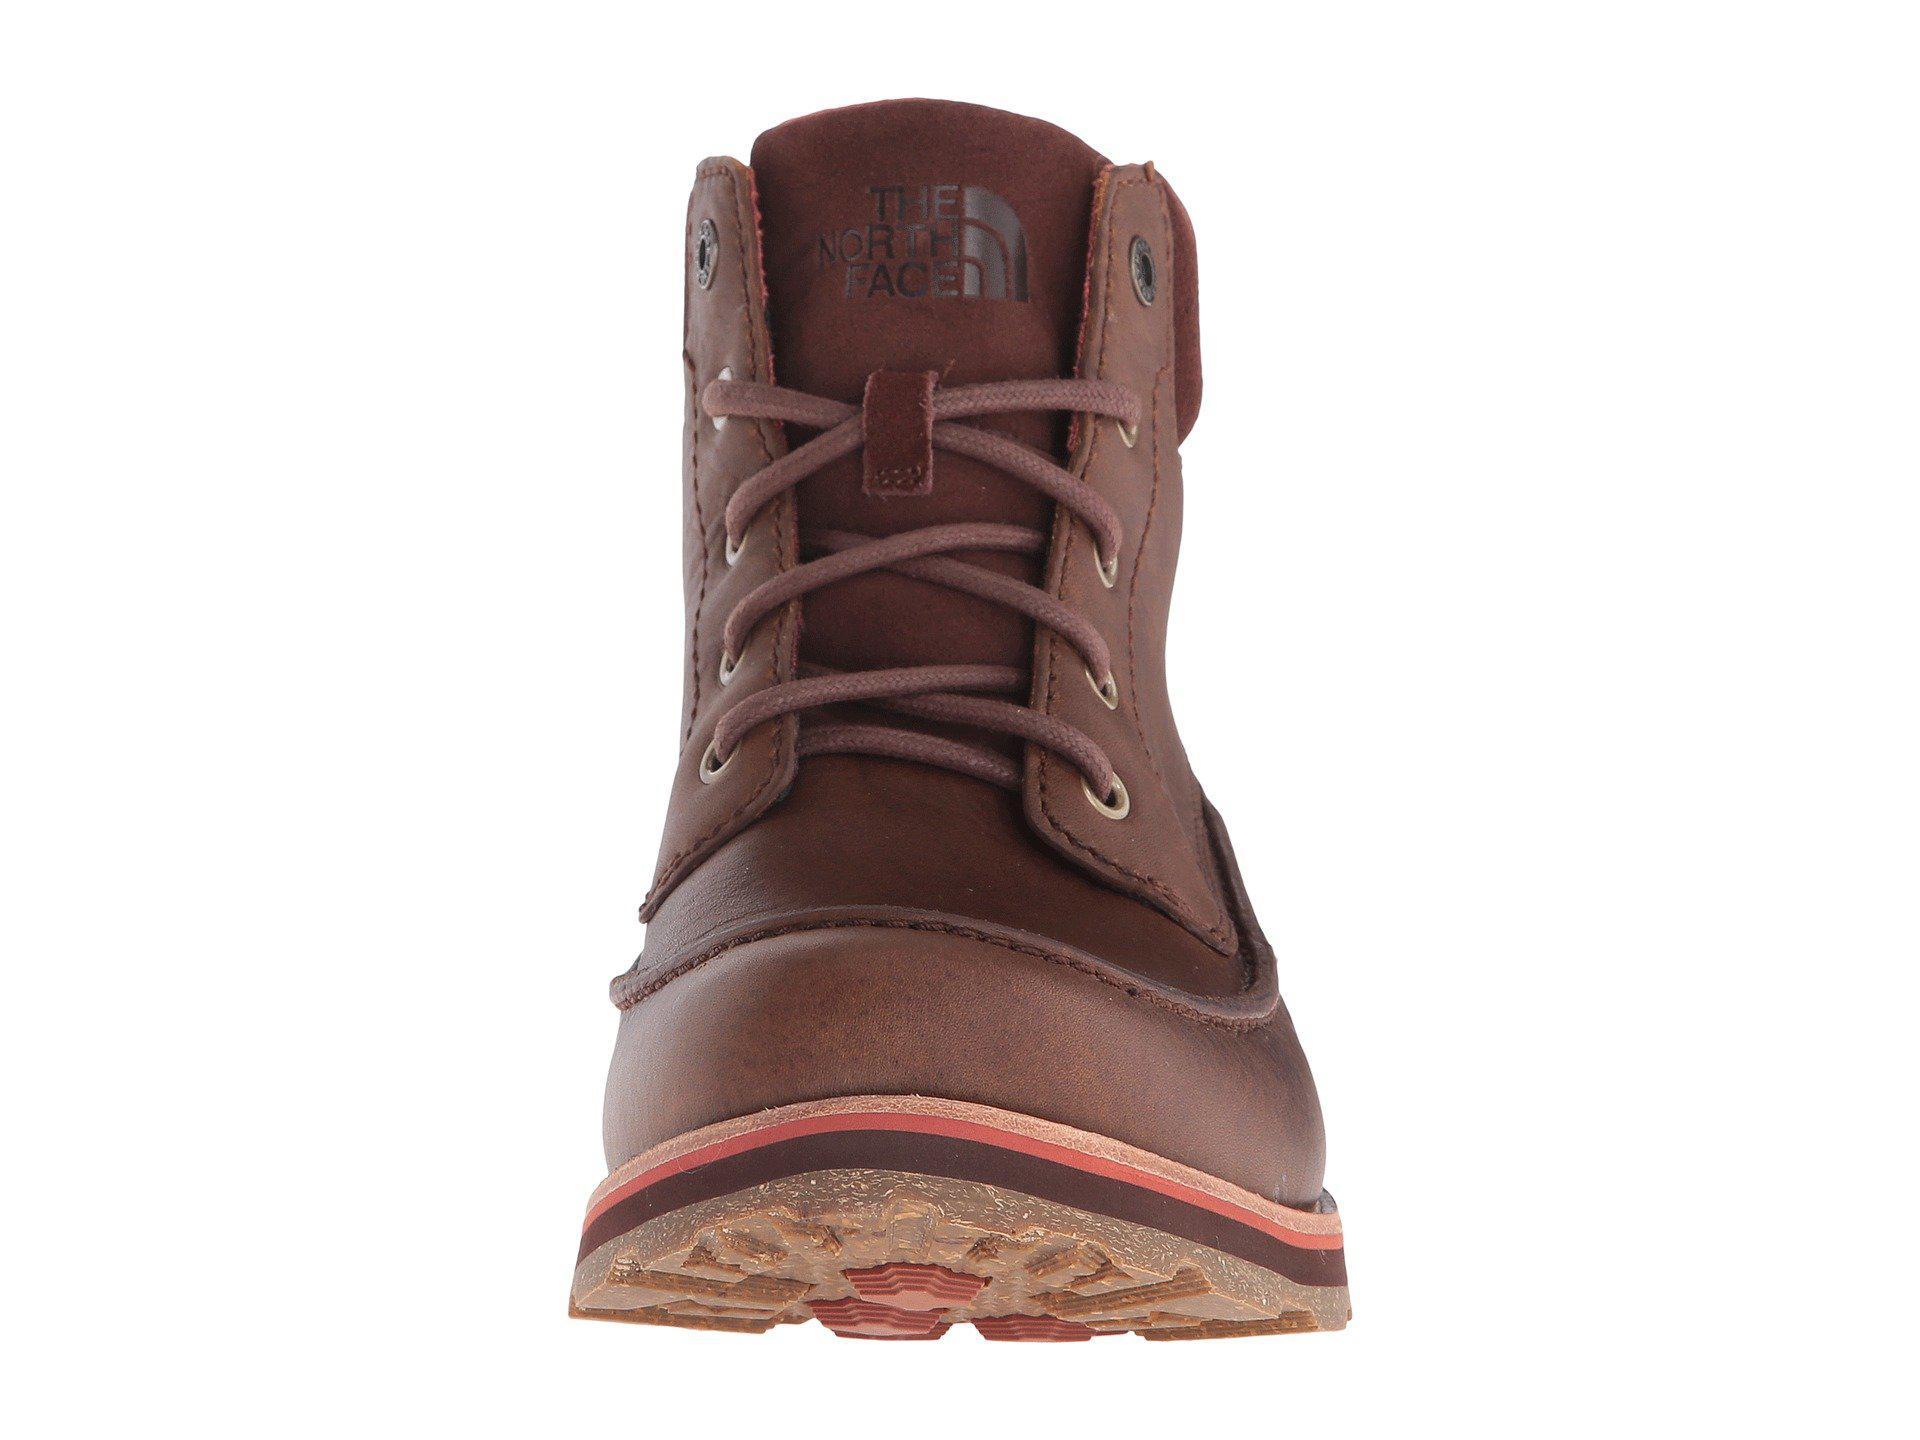 585e19ed6 Men's Brown S Bridgeton Chukka